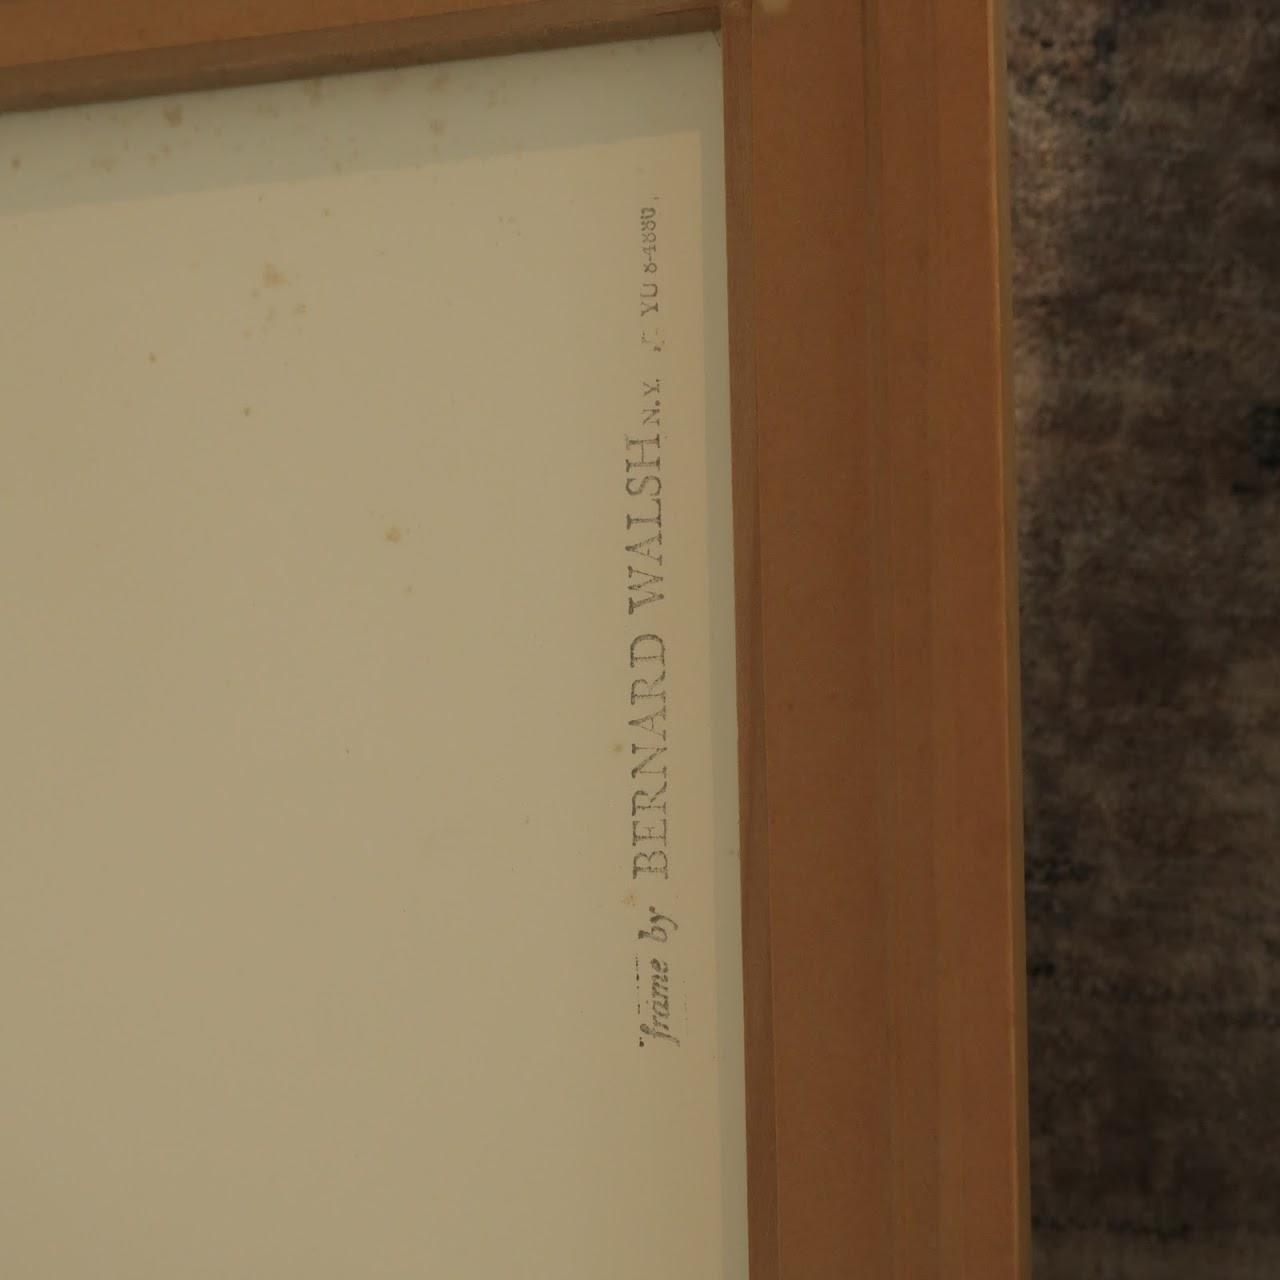 Romola Signed Graphic Aquatint Etching